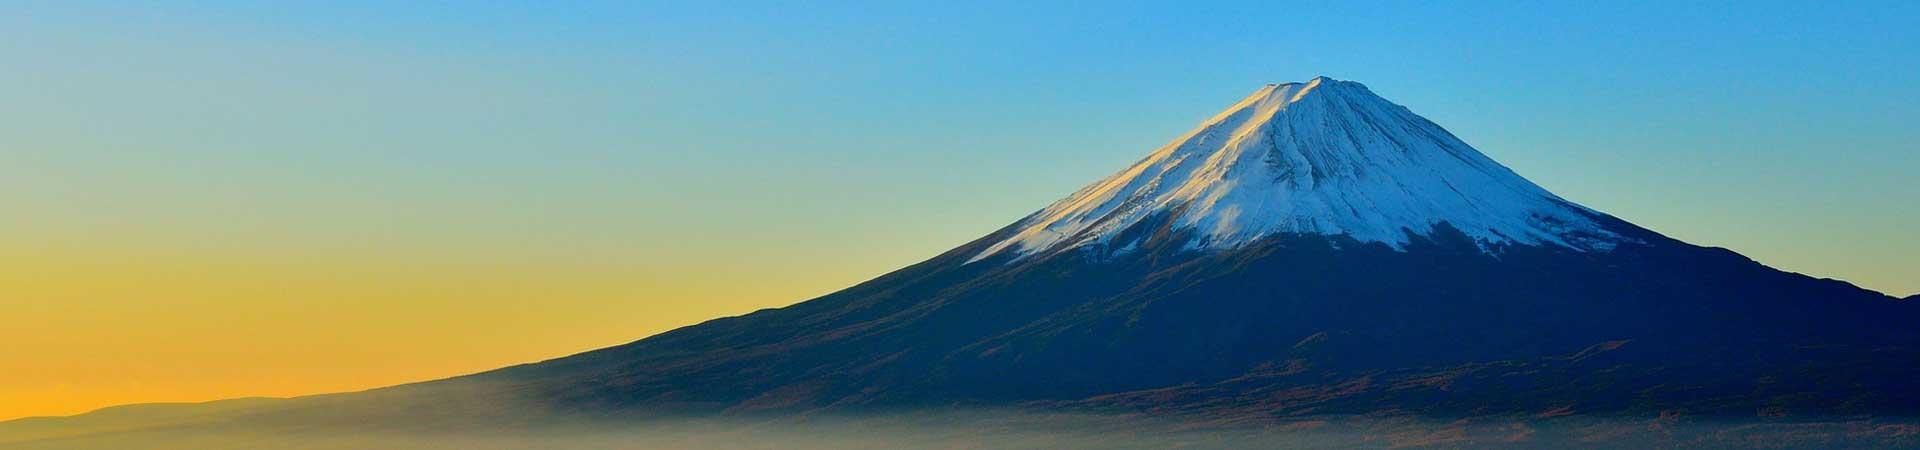 6D5N Tokyo, Mt. Fuji, Hakone & Kyoto